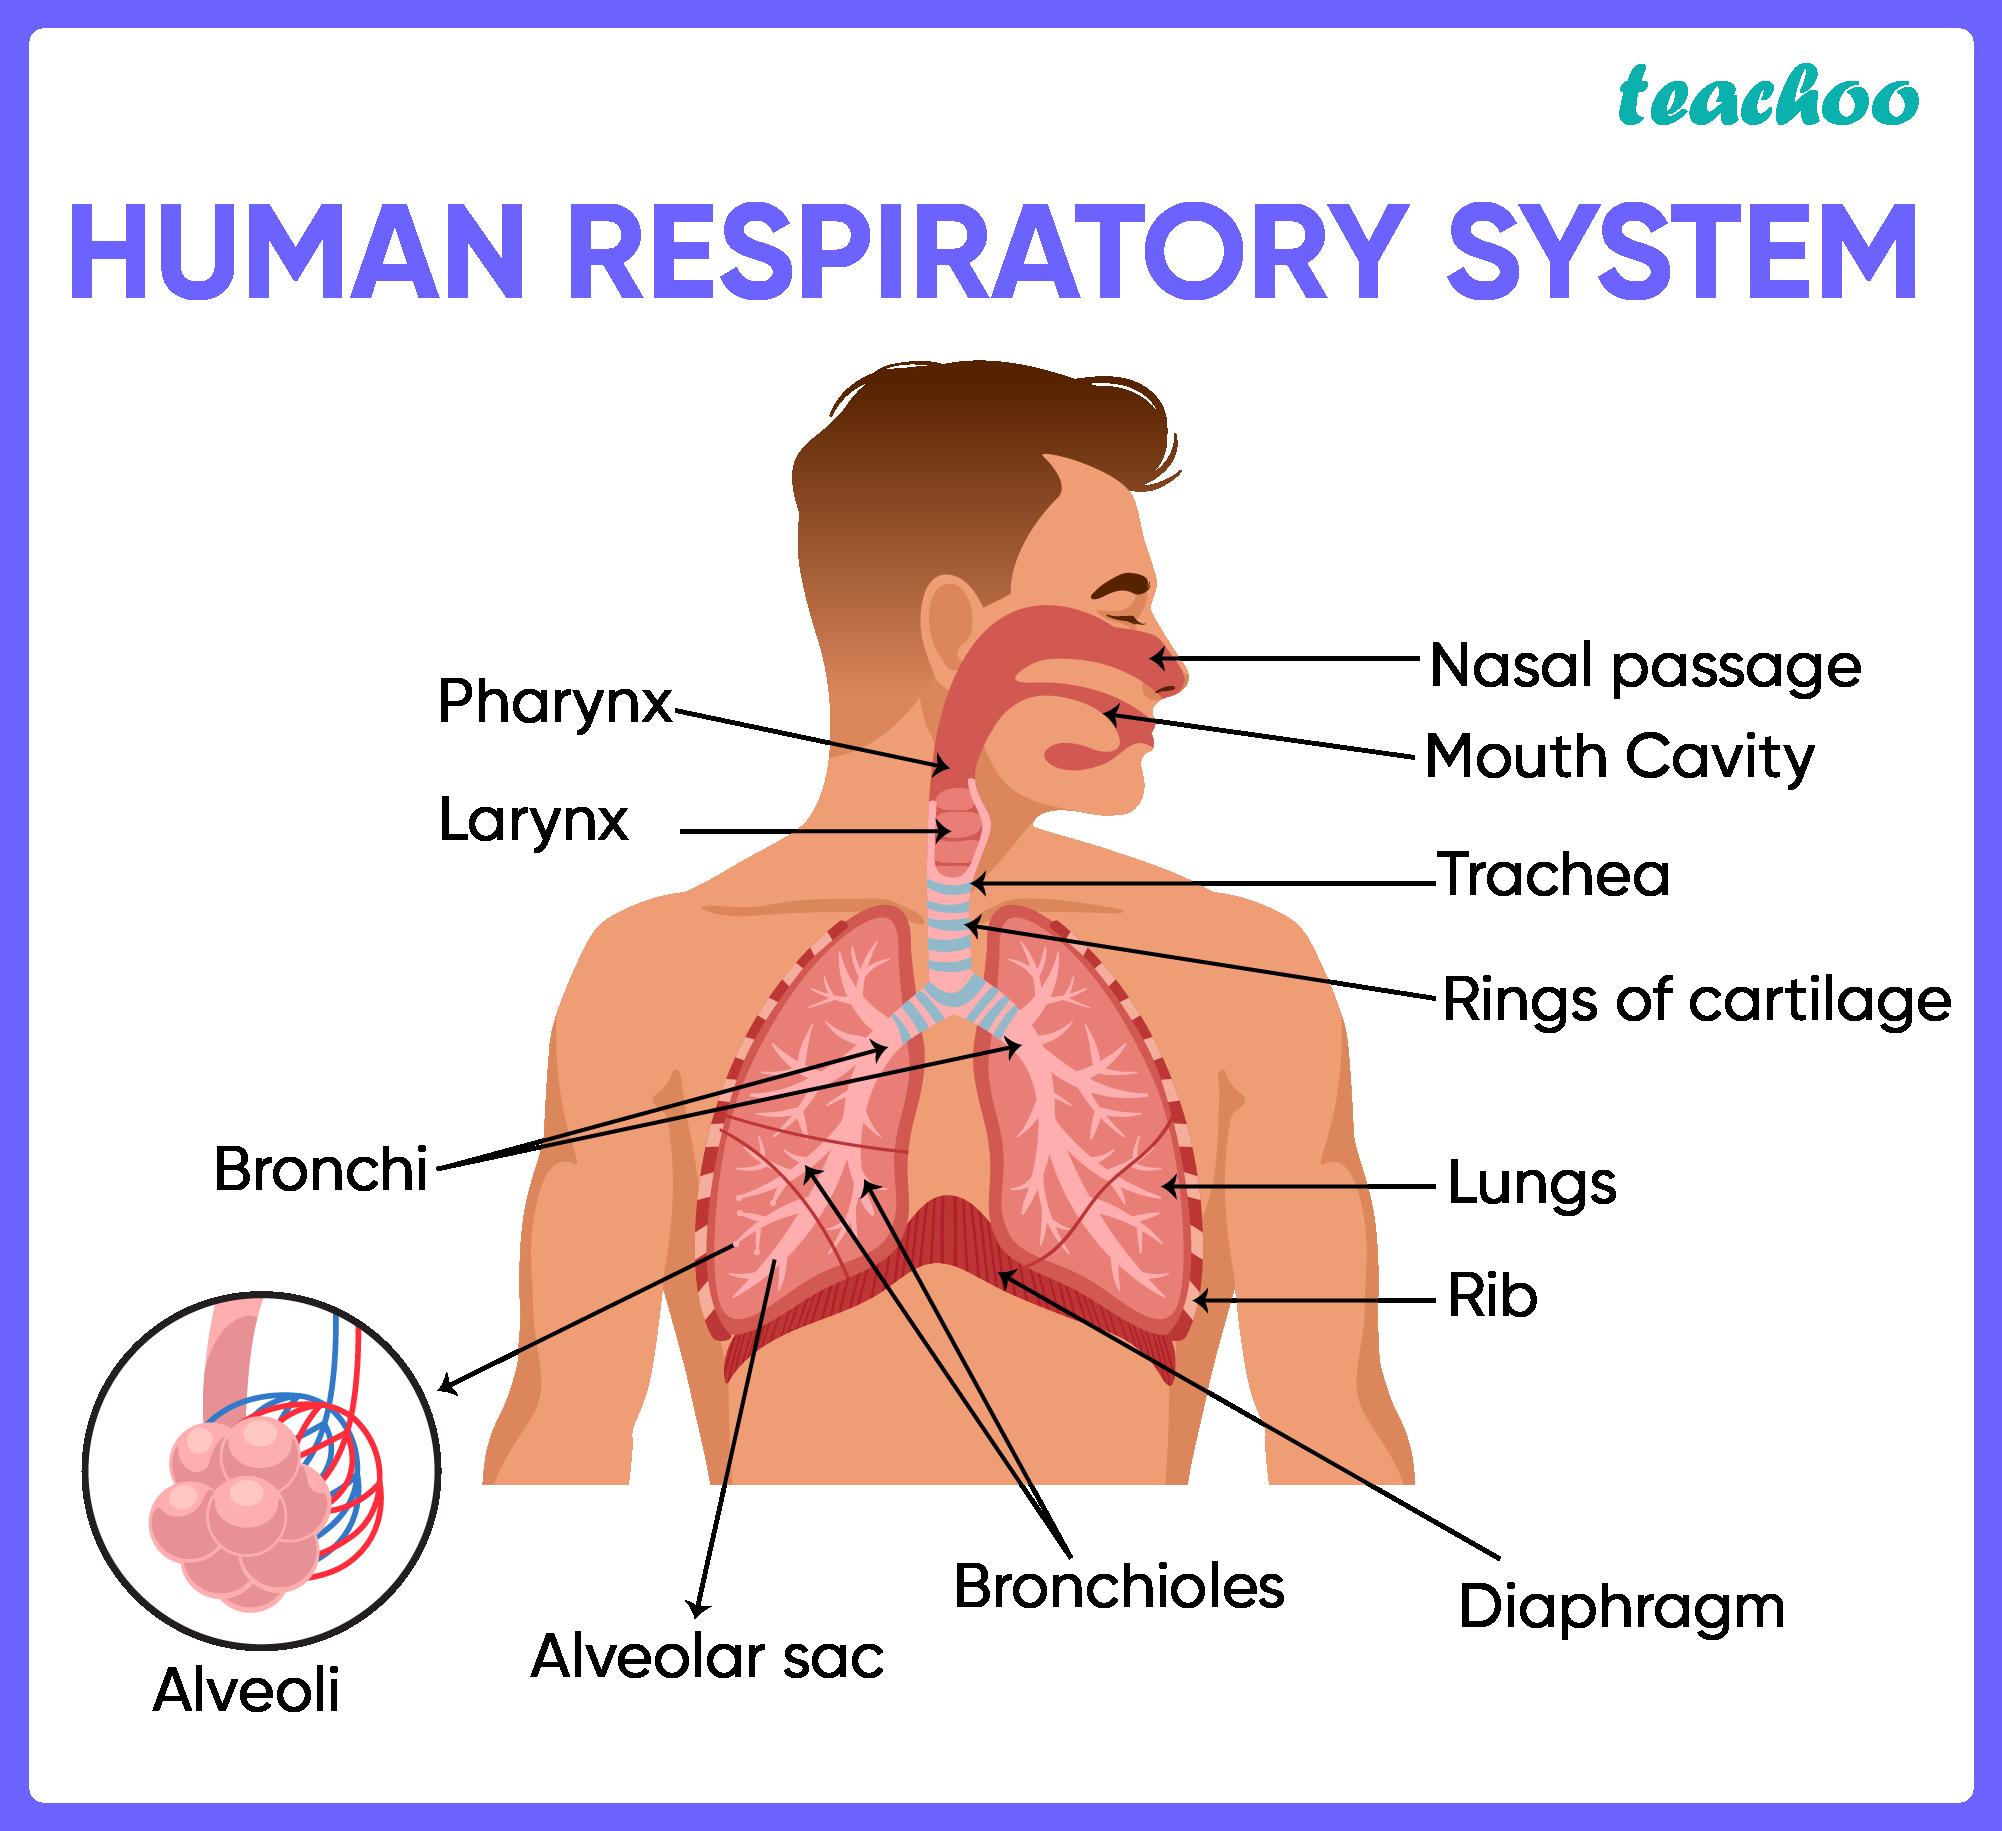 Human Respiratory System - Teachoo.png